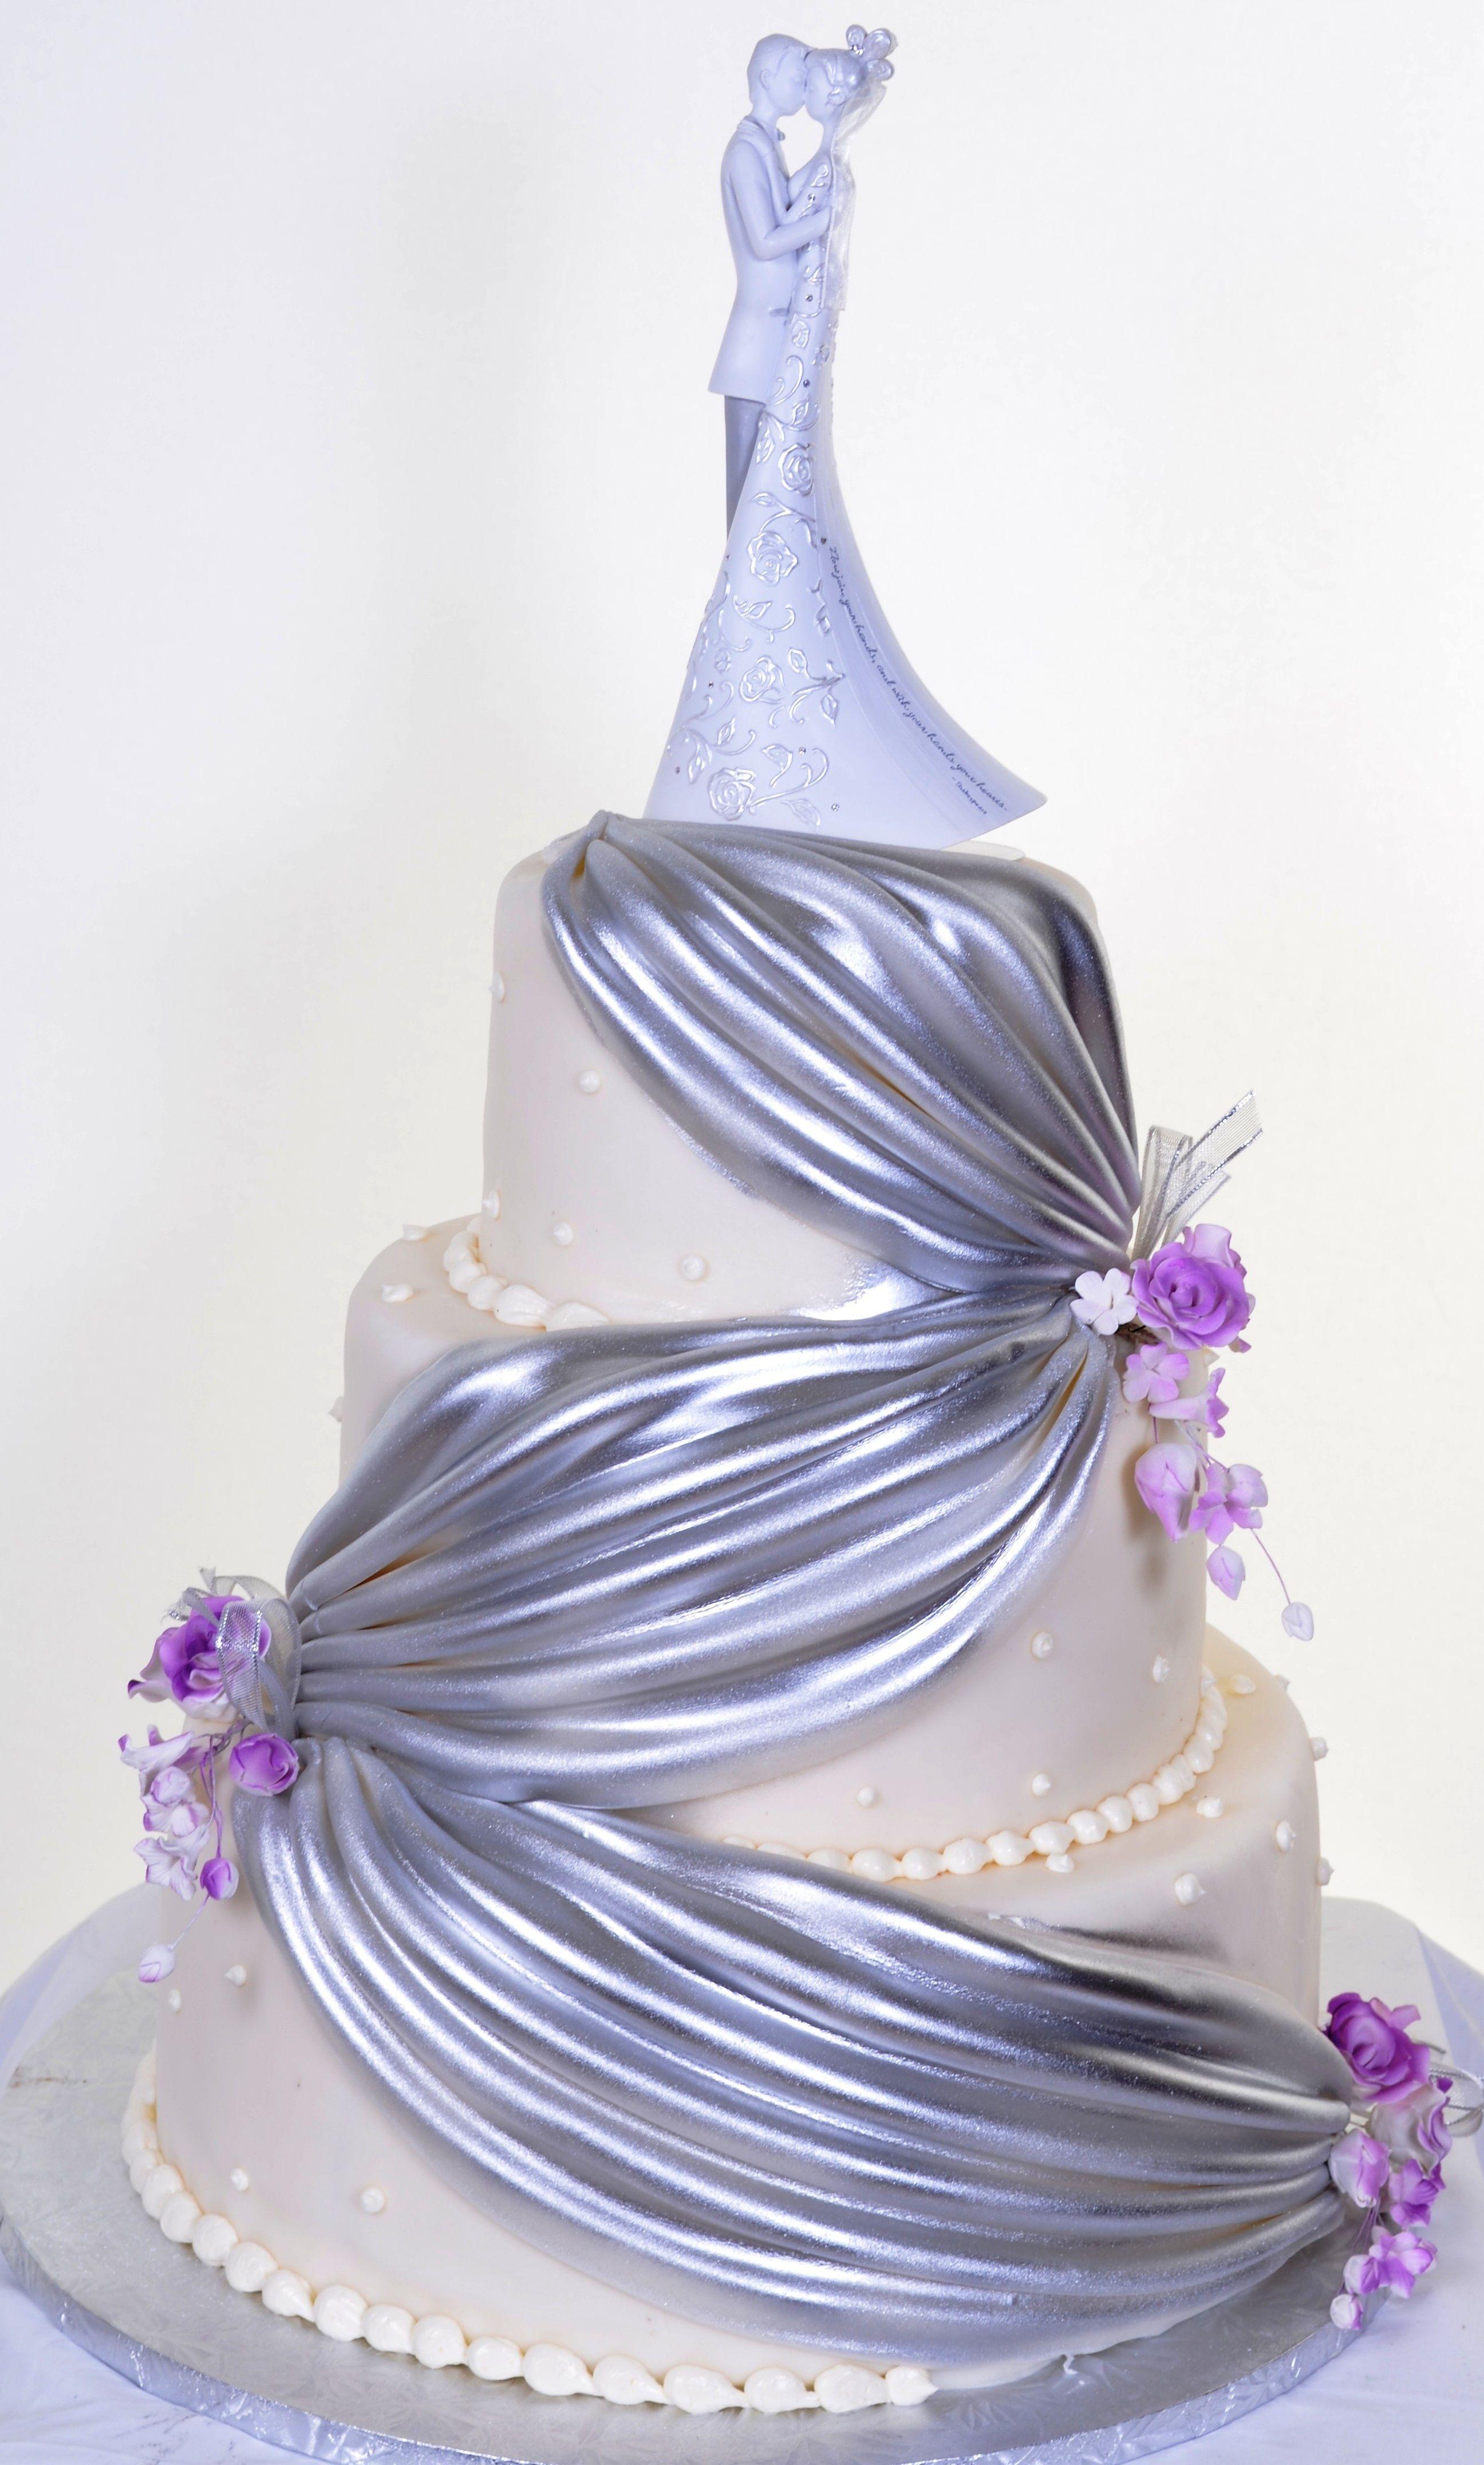 Pastry Palace Las Vegas - Wedding Cake #348 – Silver Drapes & Pearls ...